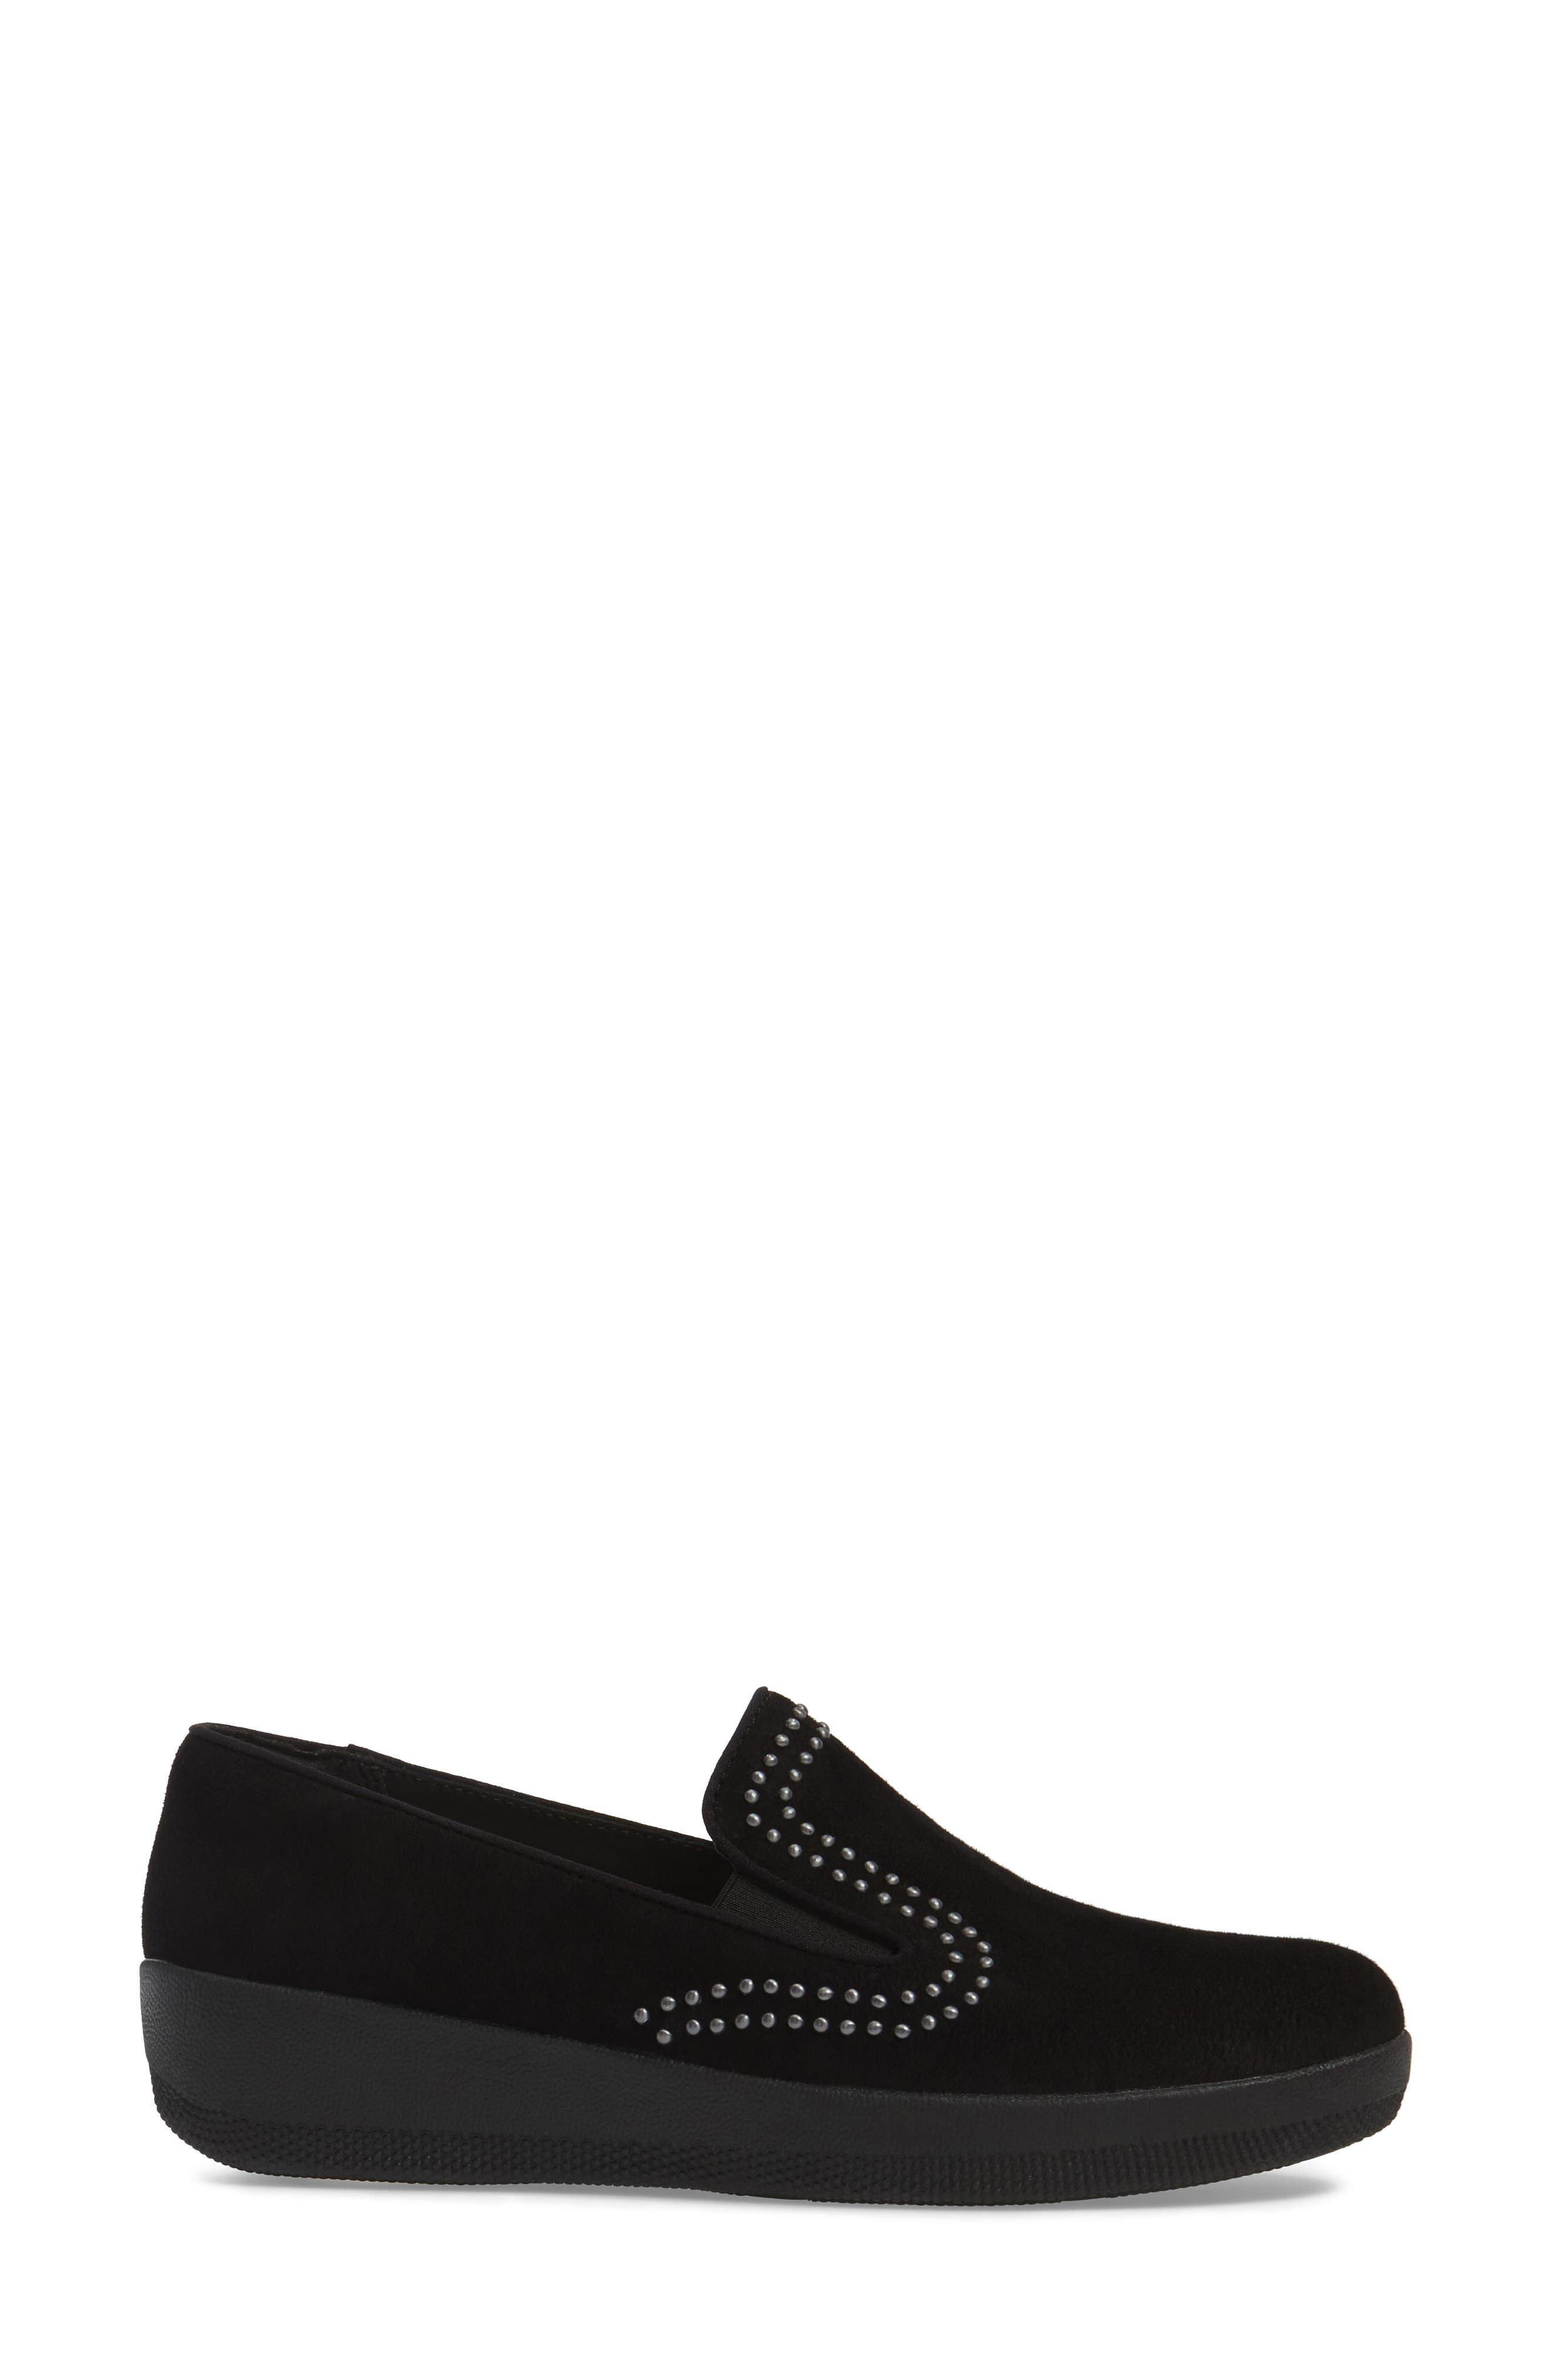 Superskate Studded Wedge Loafer,                             Alternate thumbnail 6, color,